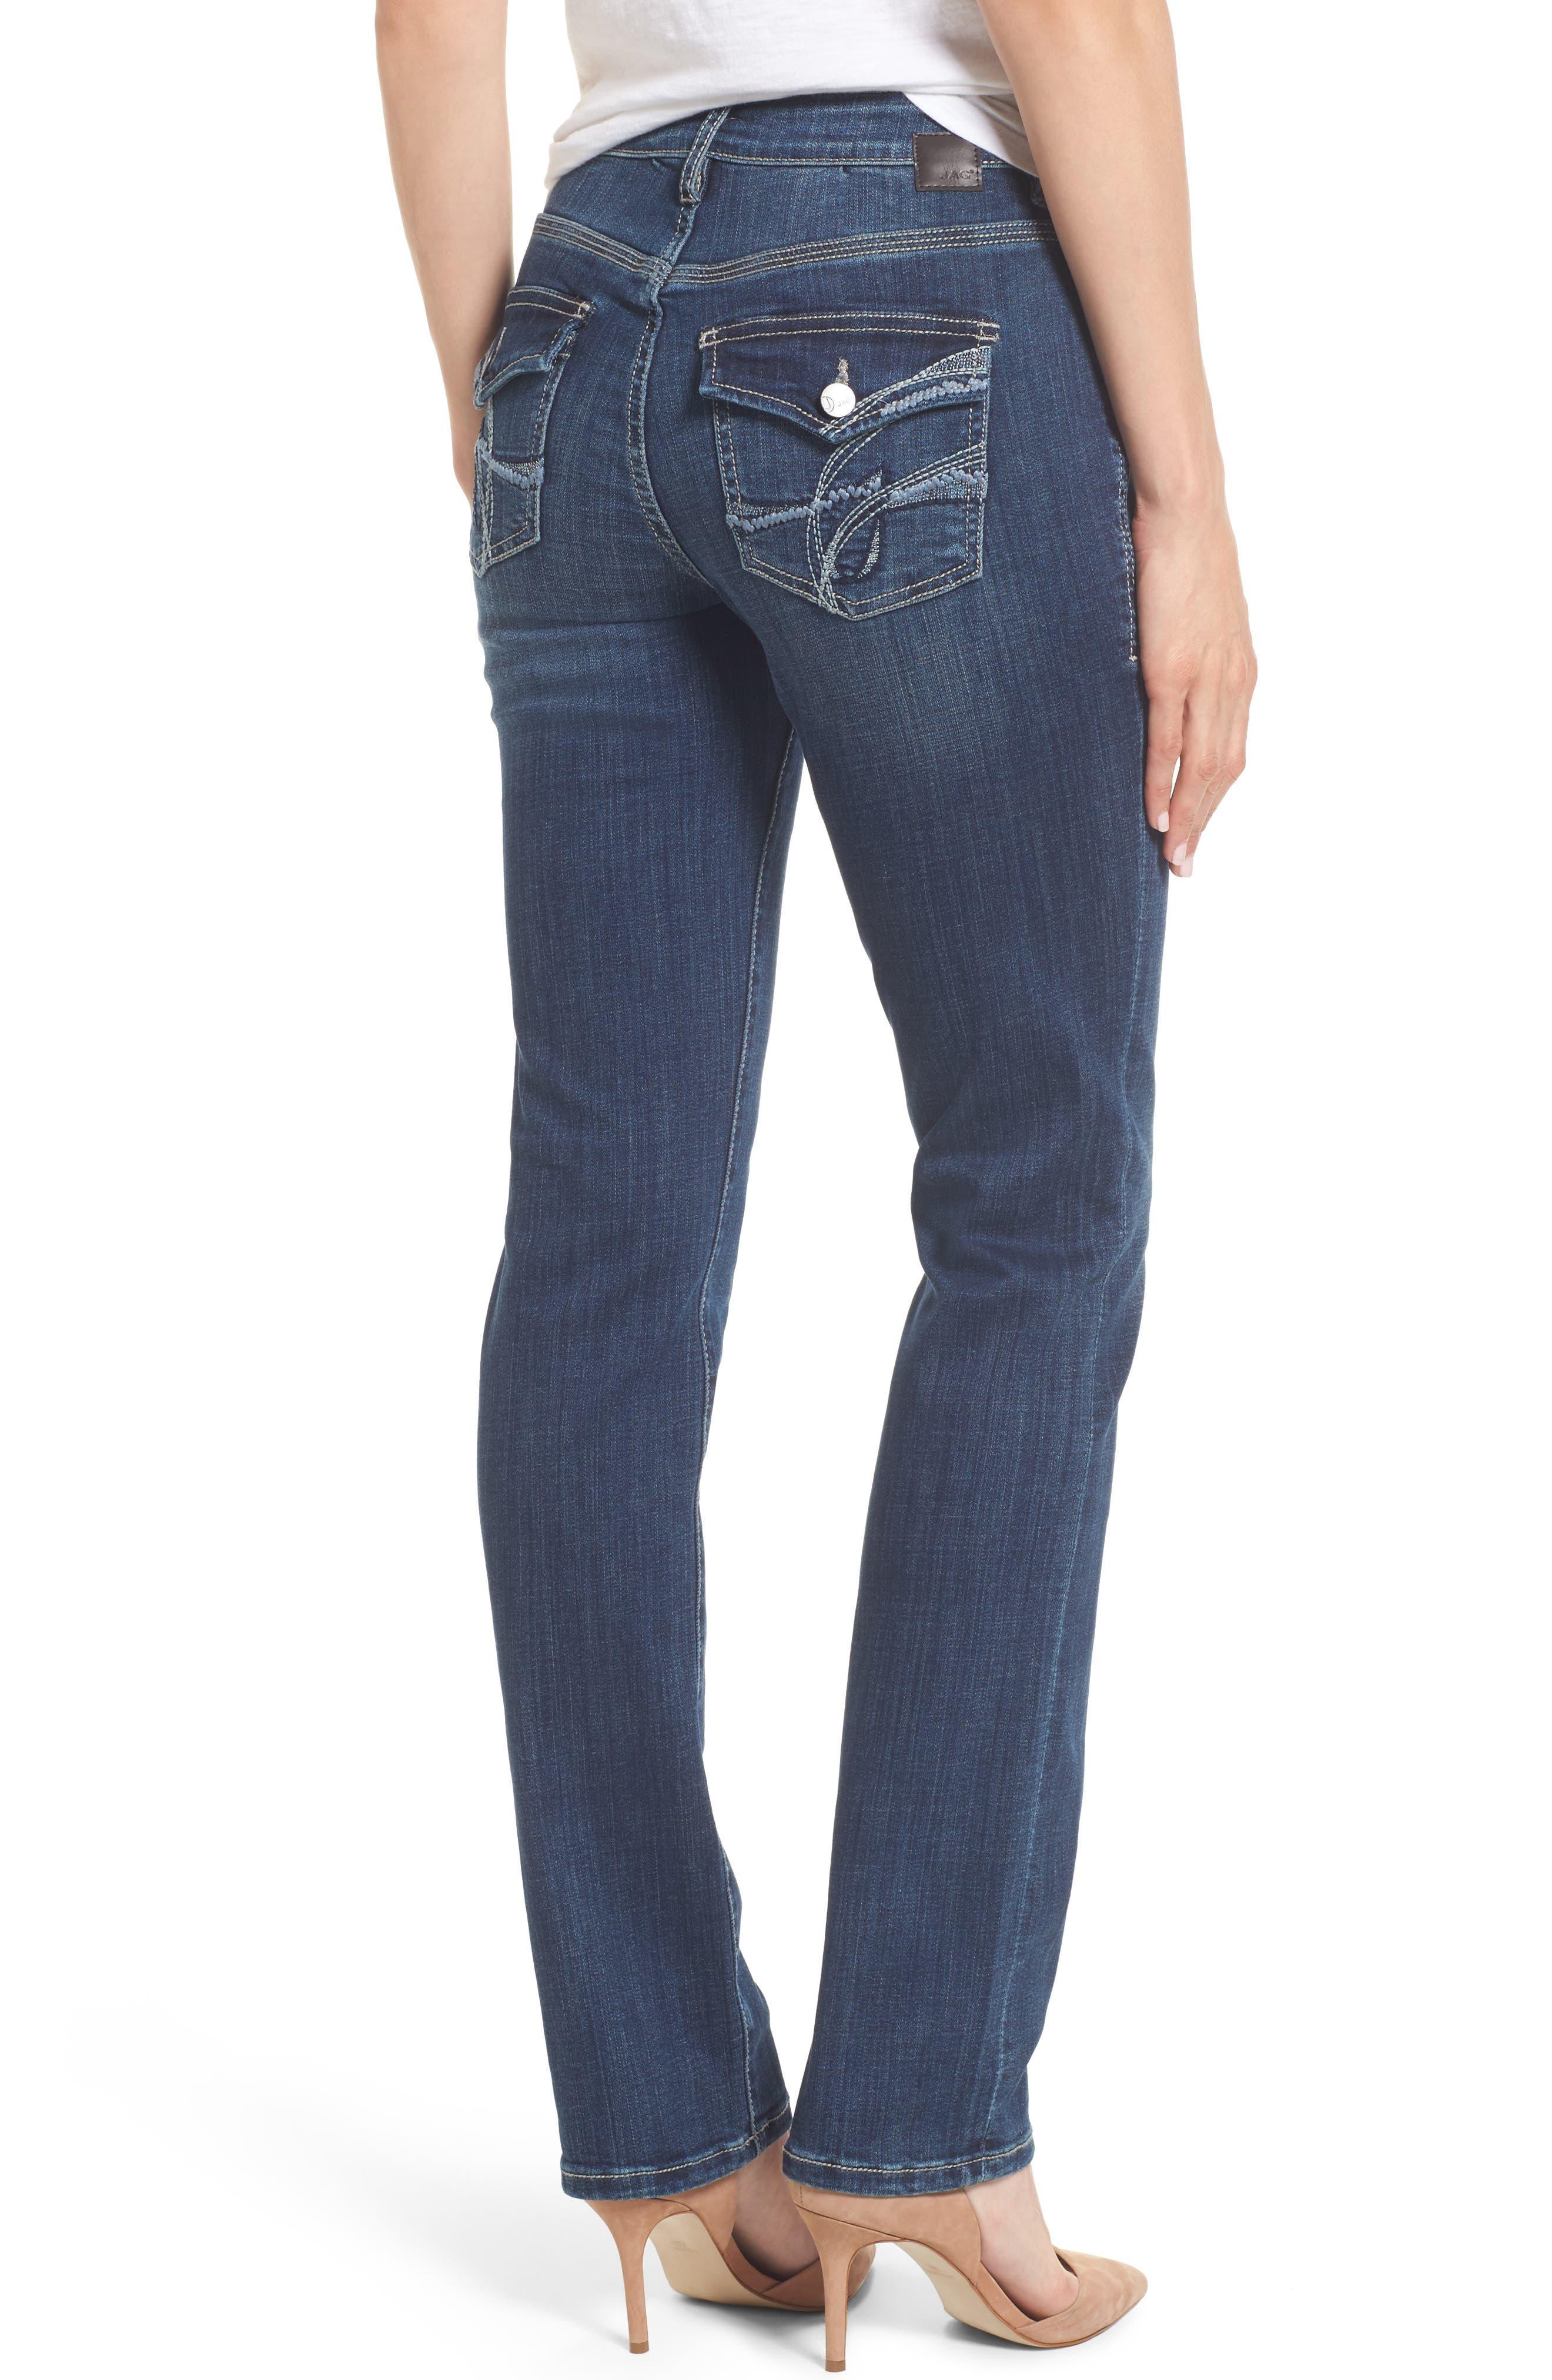 Adrian Straight Leg Jeans,                             Alternate thumbnail 2, color,                             Thorne Blue